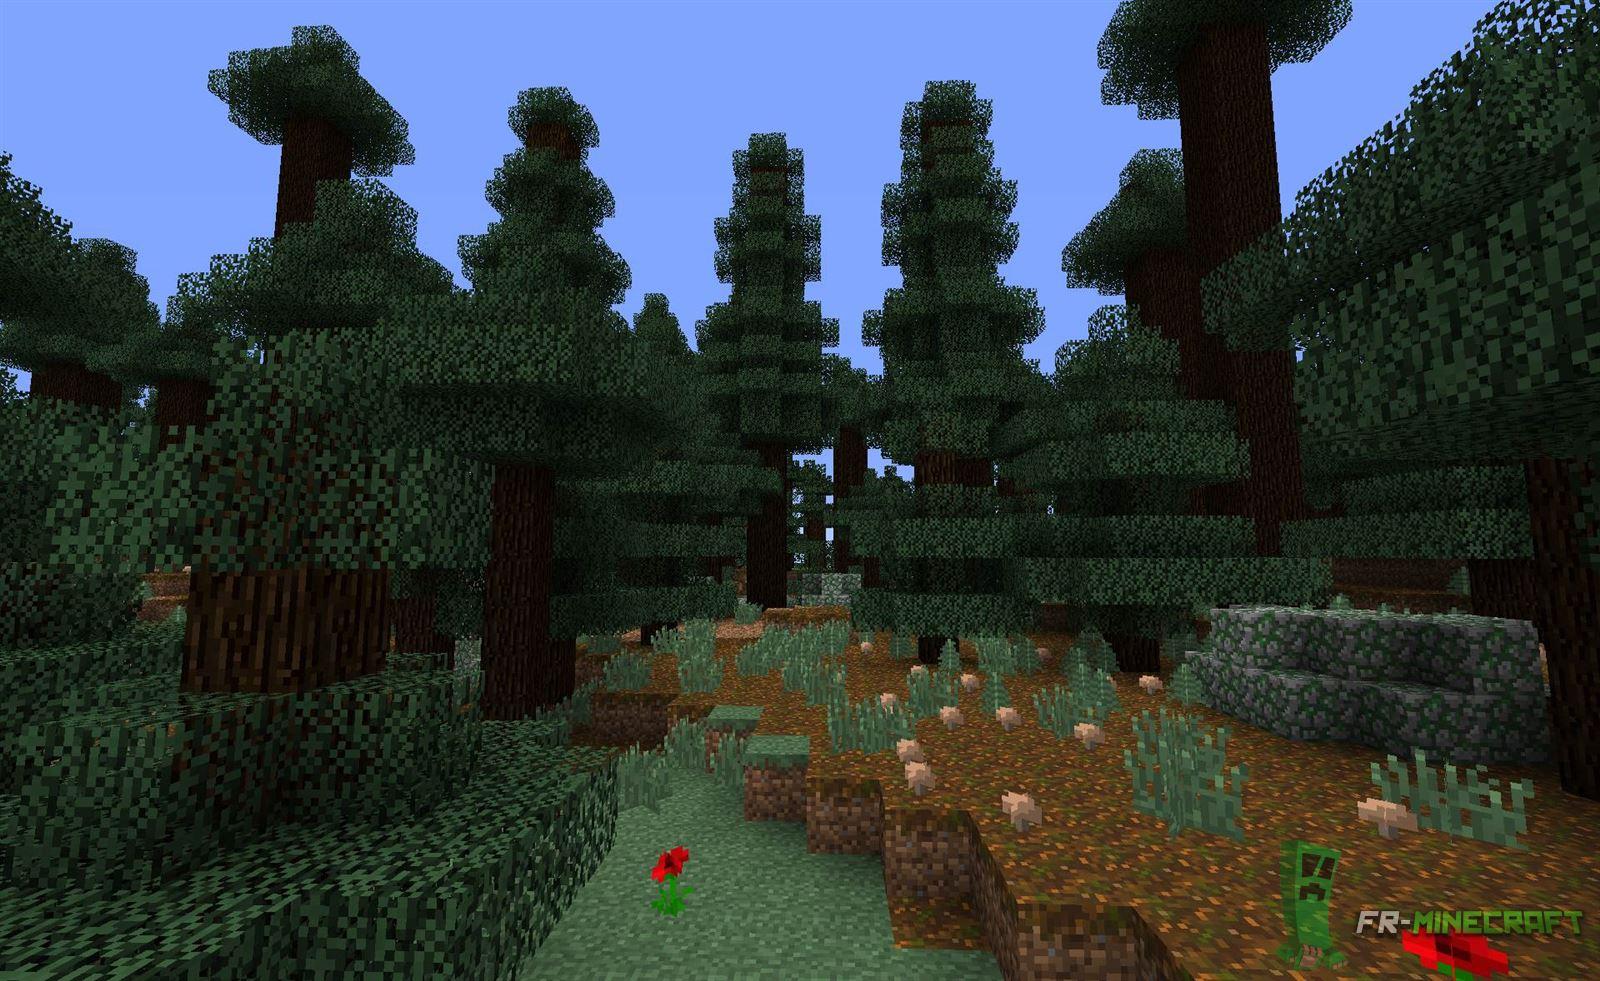 minecraft biome ta ga grands arbres. Black Bedroom Furniture Sets. Home Design Ideas